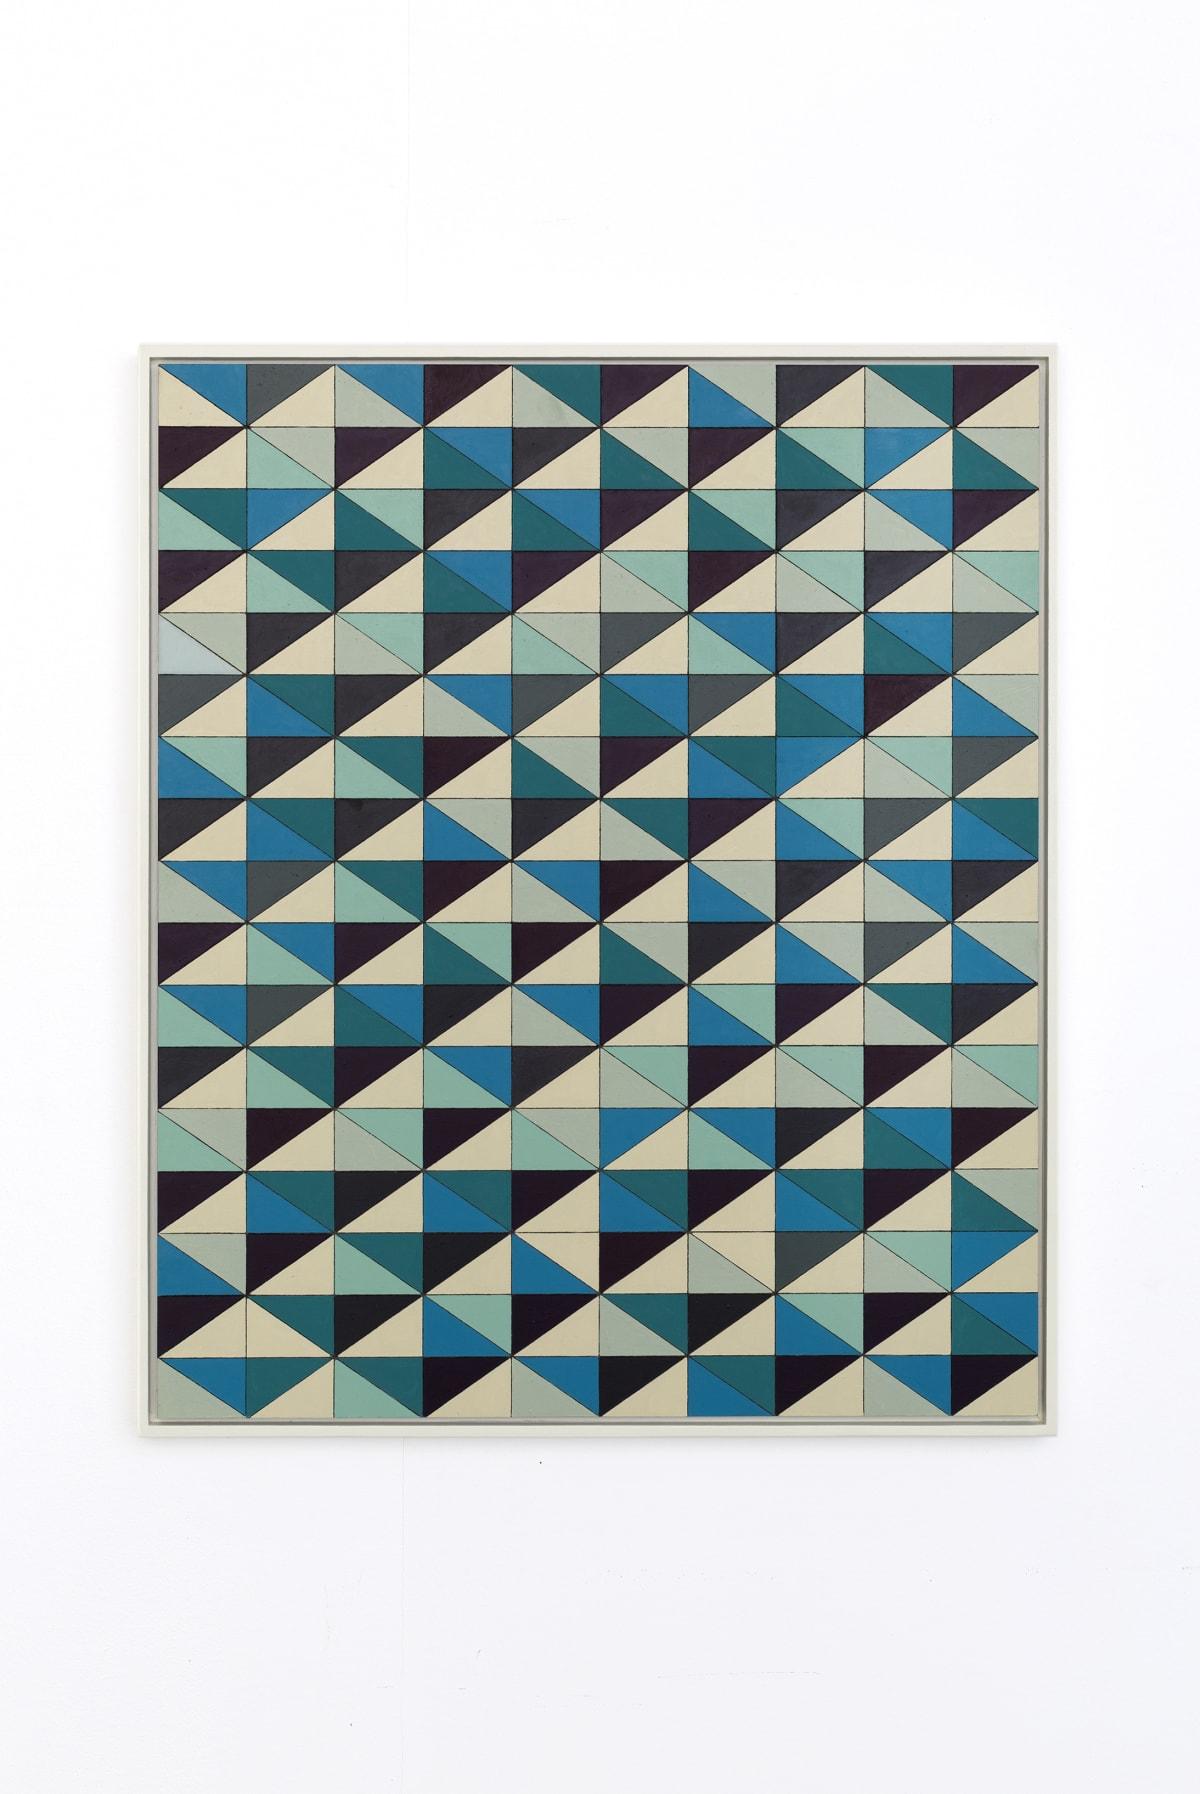 Thomas Raat, Fragment, 2019